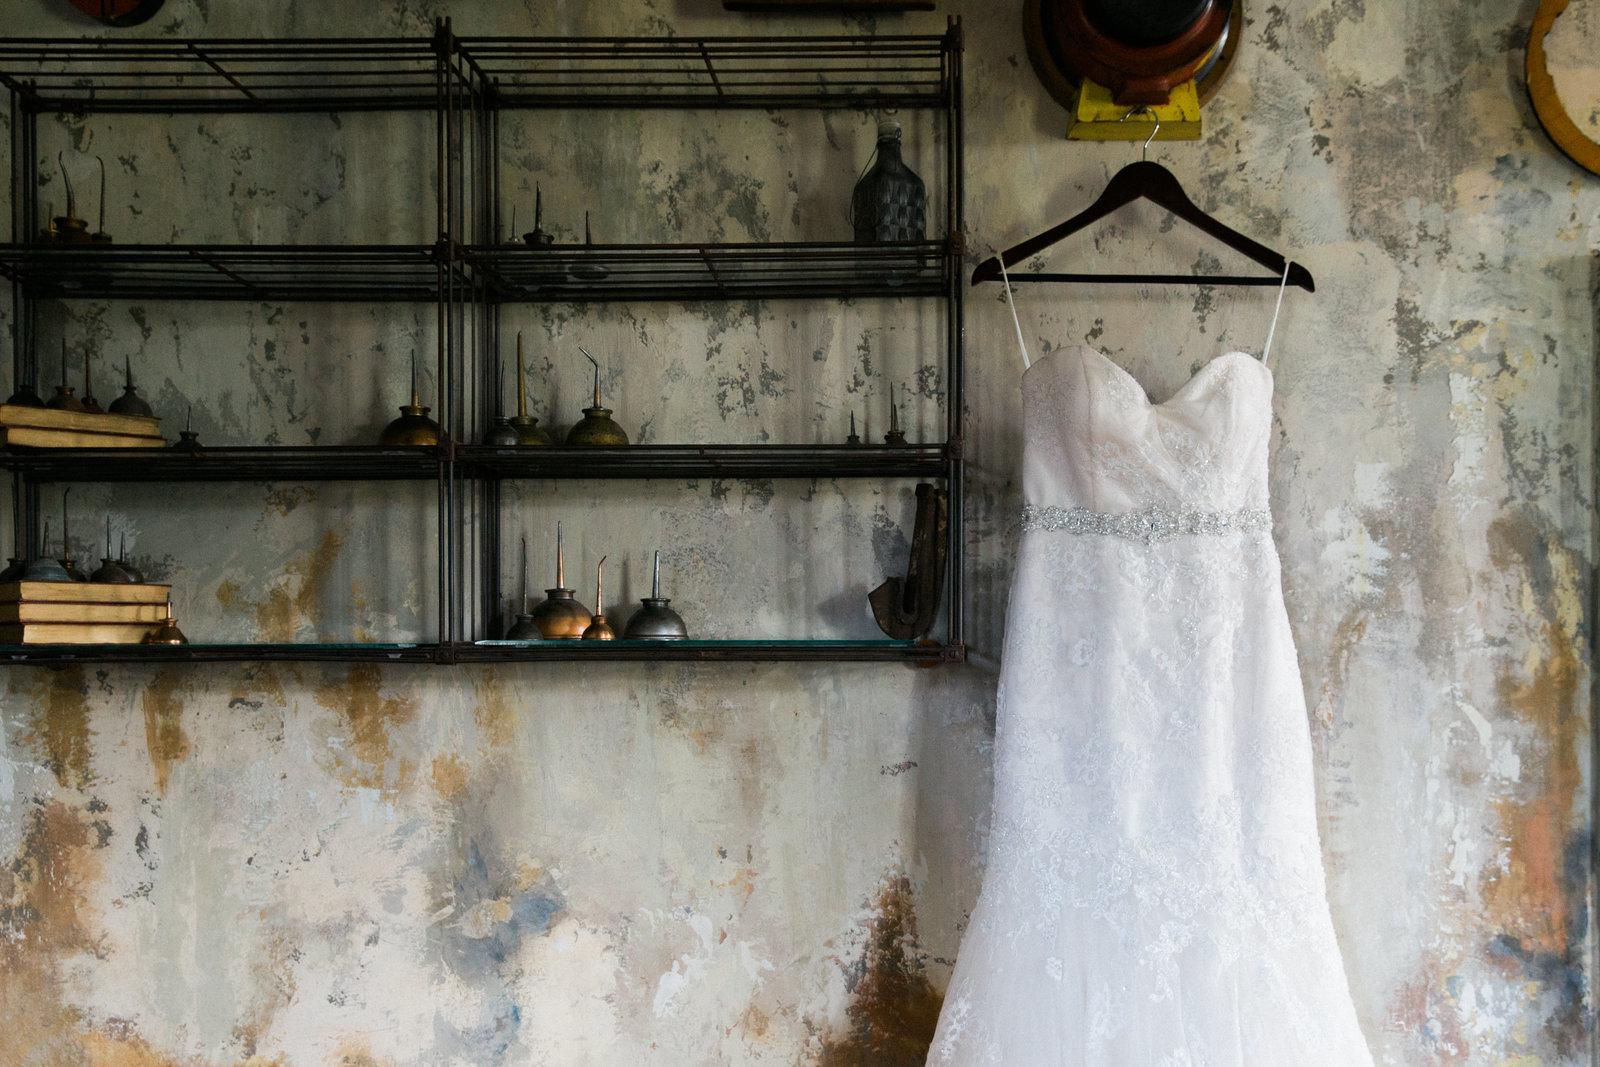 Corcoran_02_Bridal-Details_050